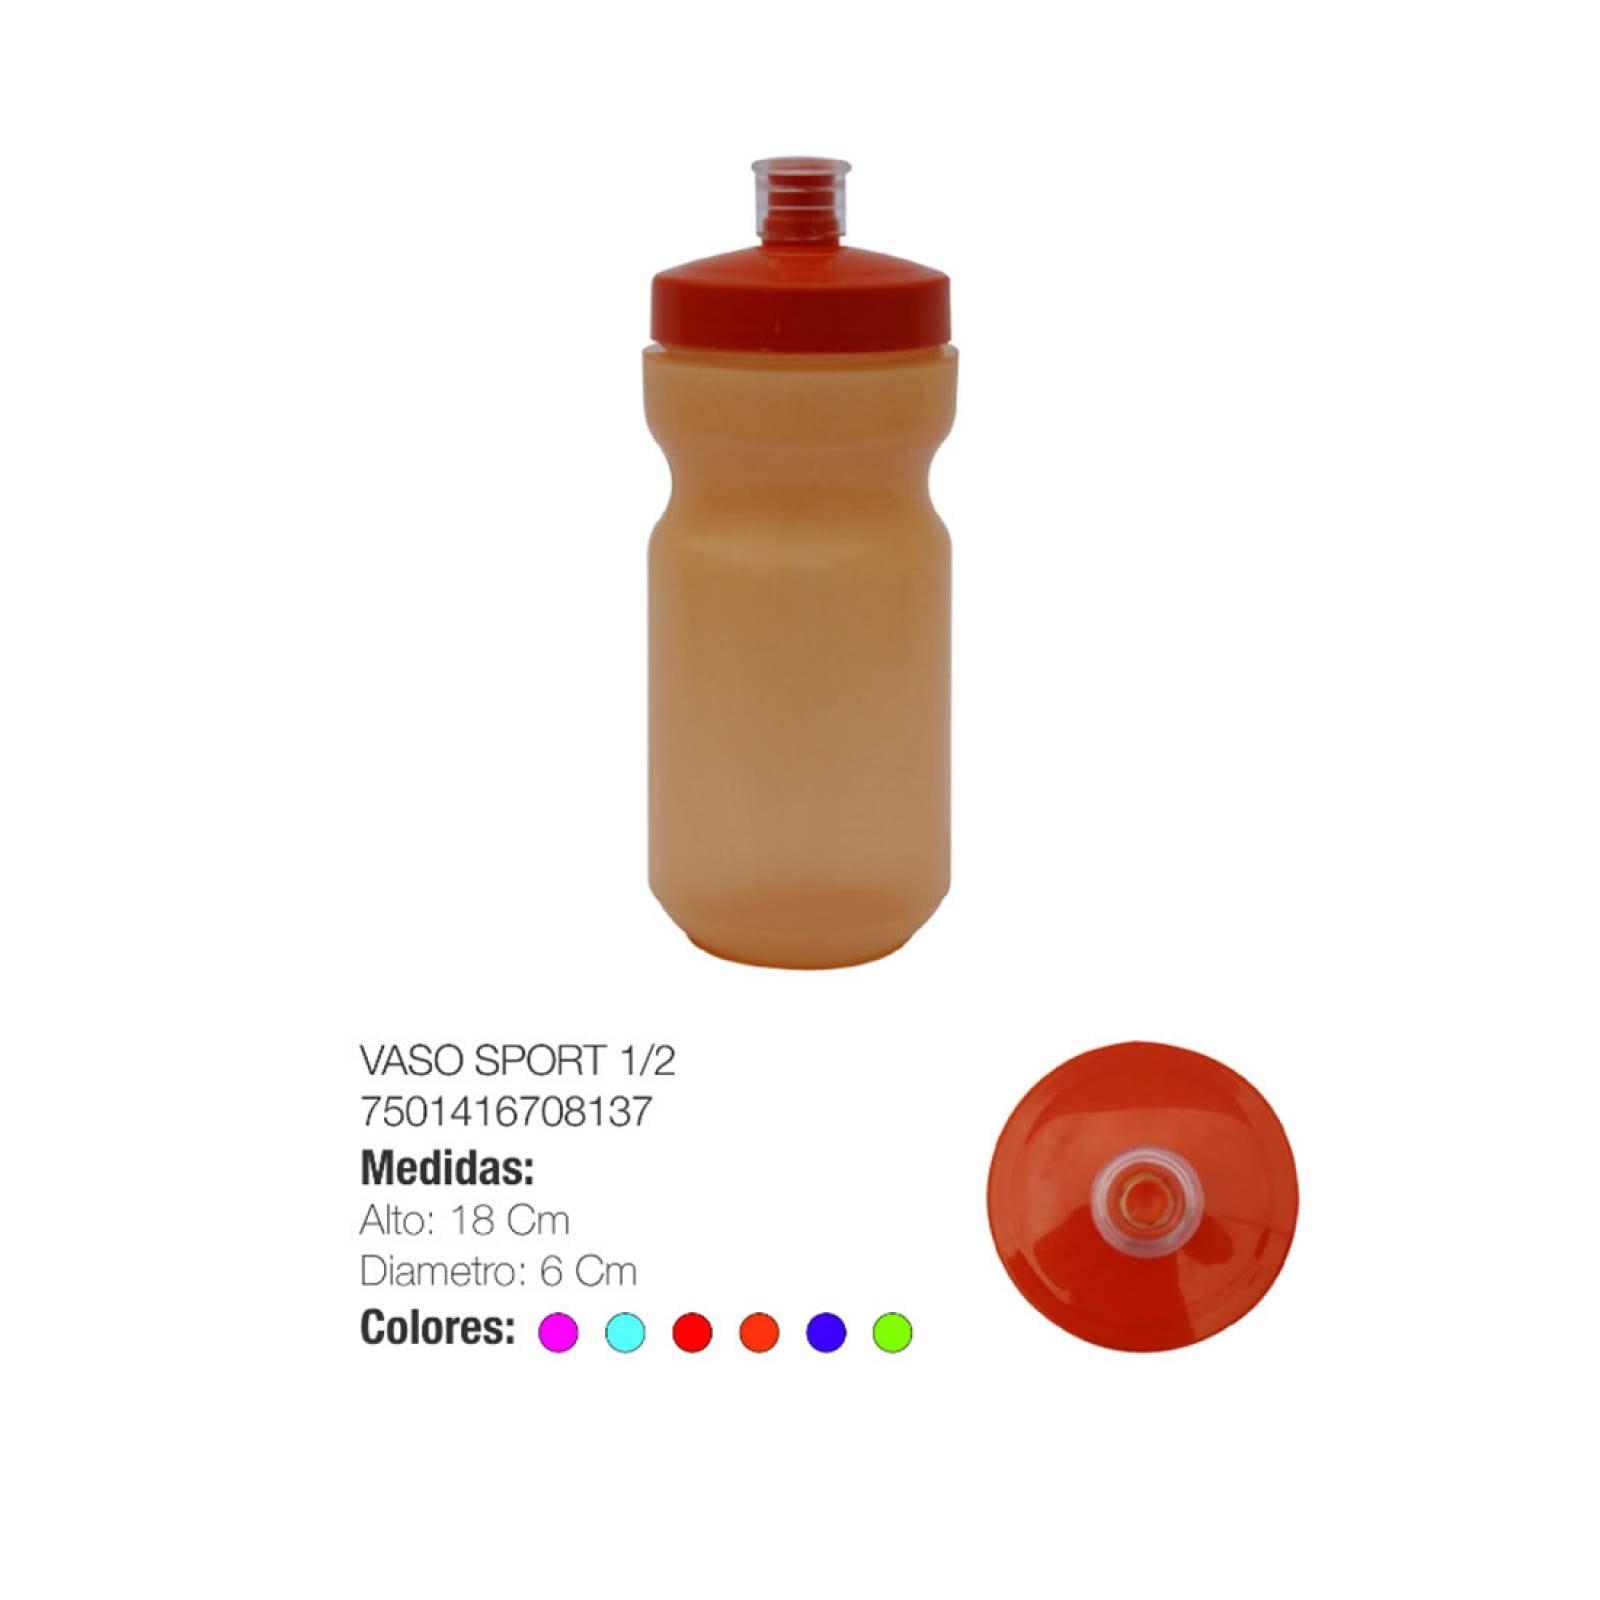 Vaso Cilindro Sport Plástico 1/2 Lt Hogar Torosqui Assorted